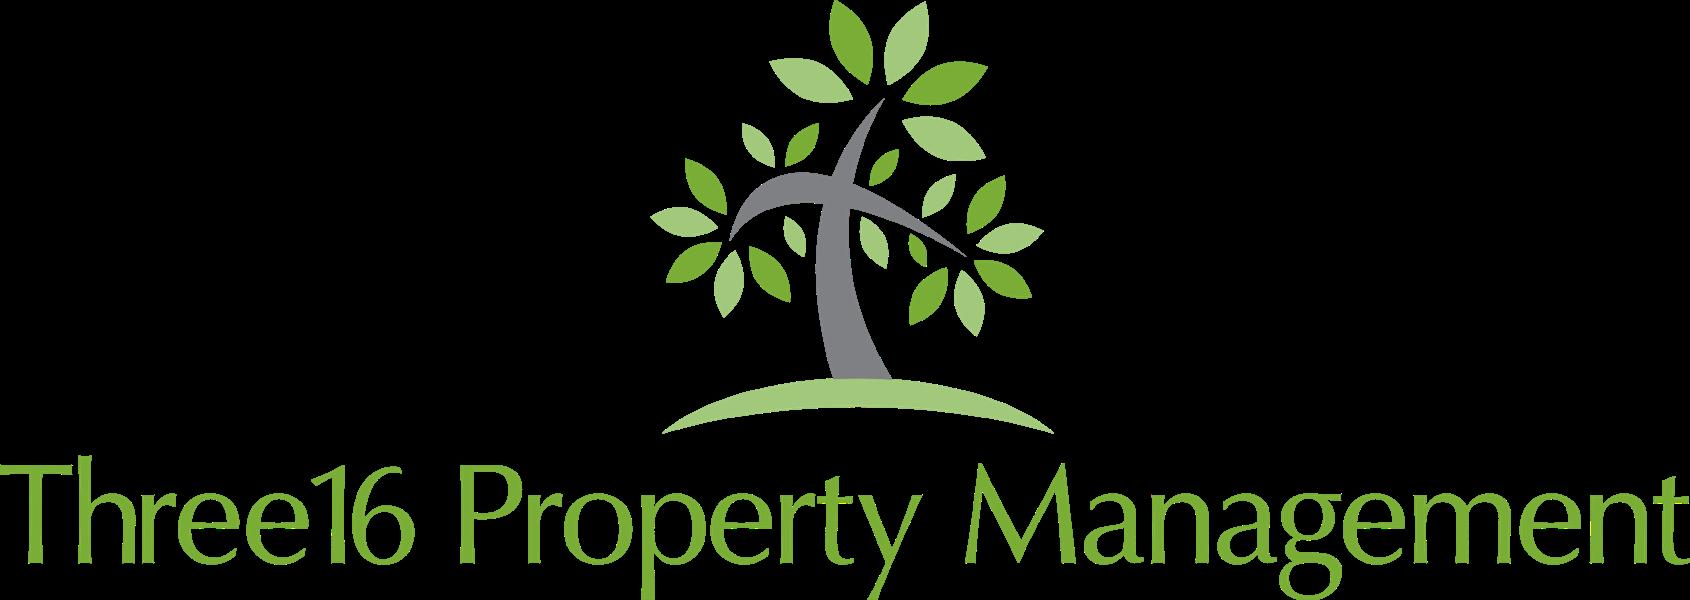 Three16 Property Management